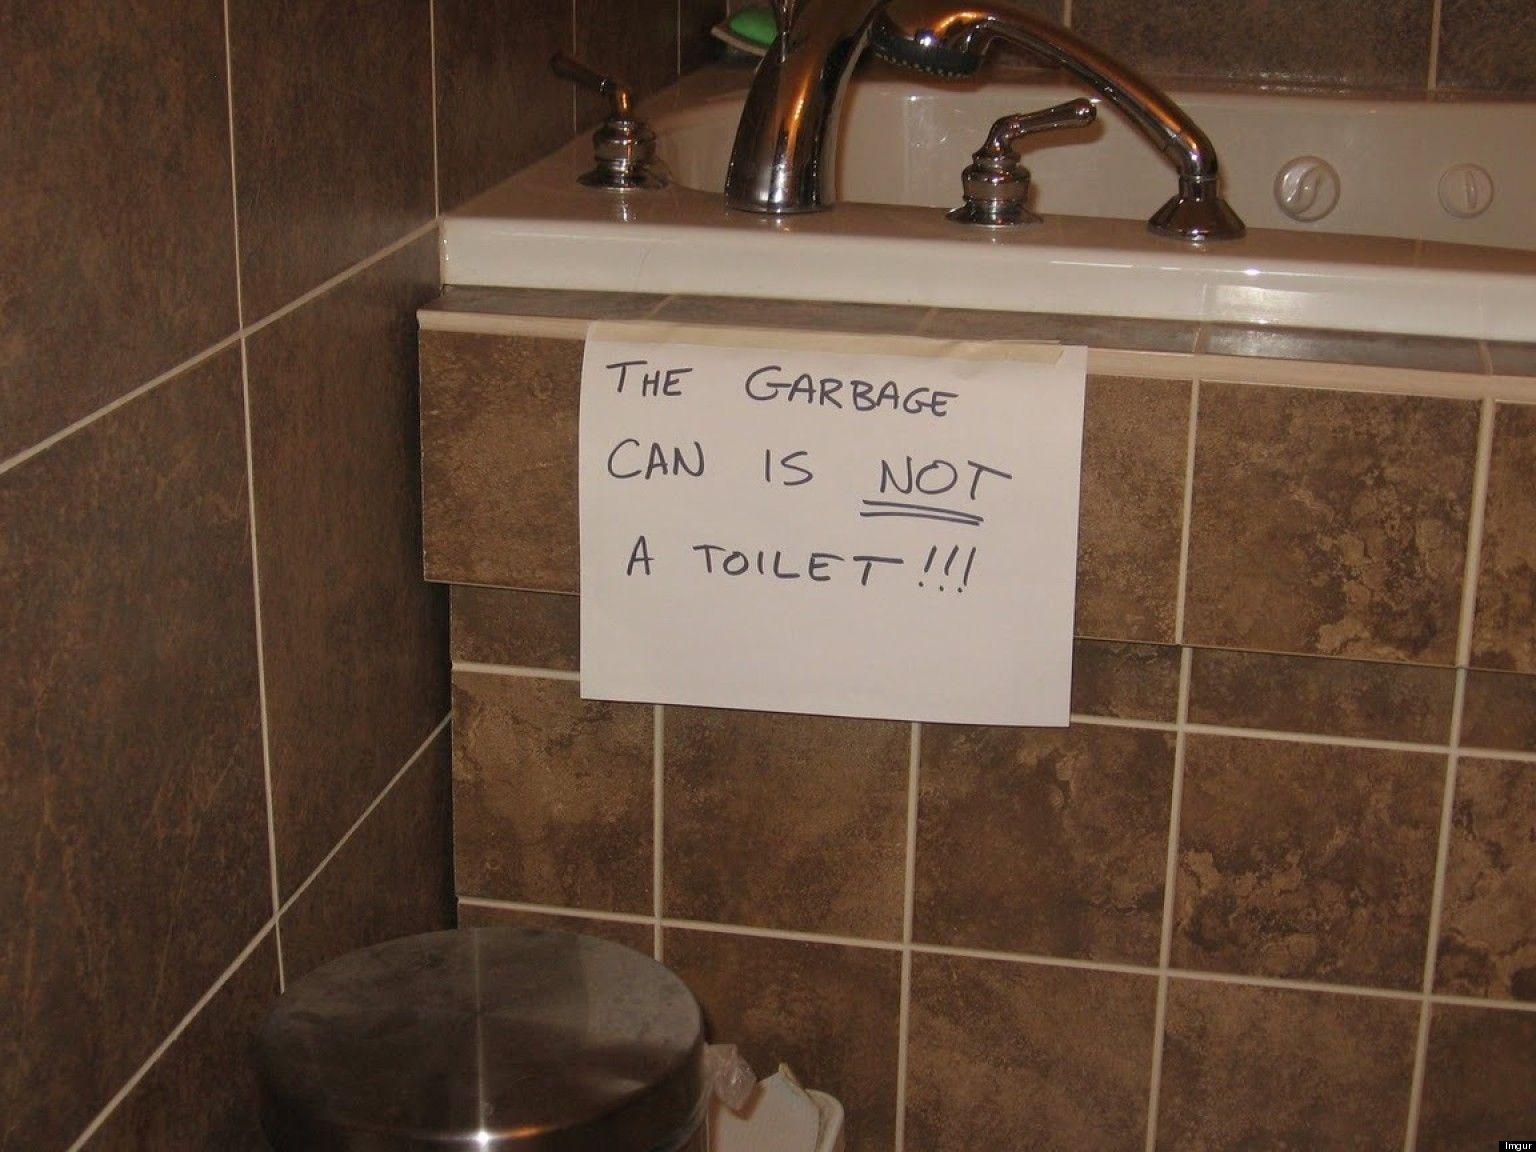 Bathroom Signs Video bathroom signs funny | ideas | pinterest | bathroom images